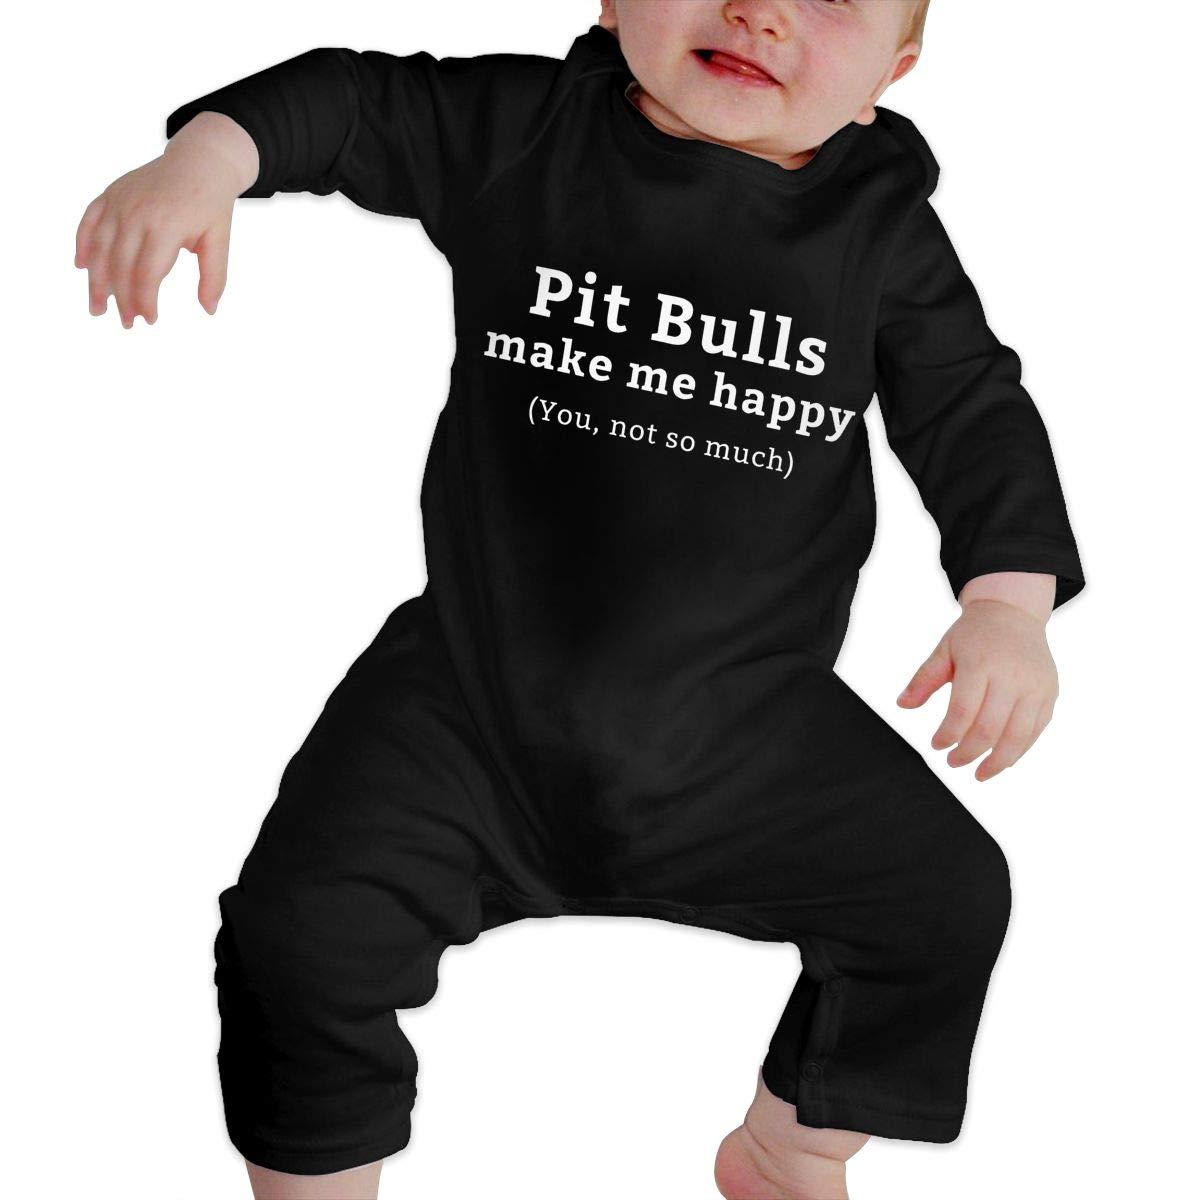 KAYERDELLE Happy Pitbull Long-Sleeve Unisex Baby Onesies for 6-24 Months Infant